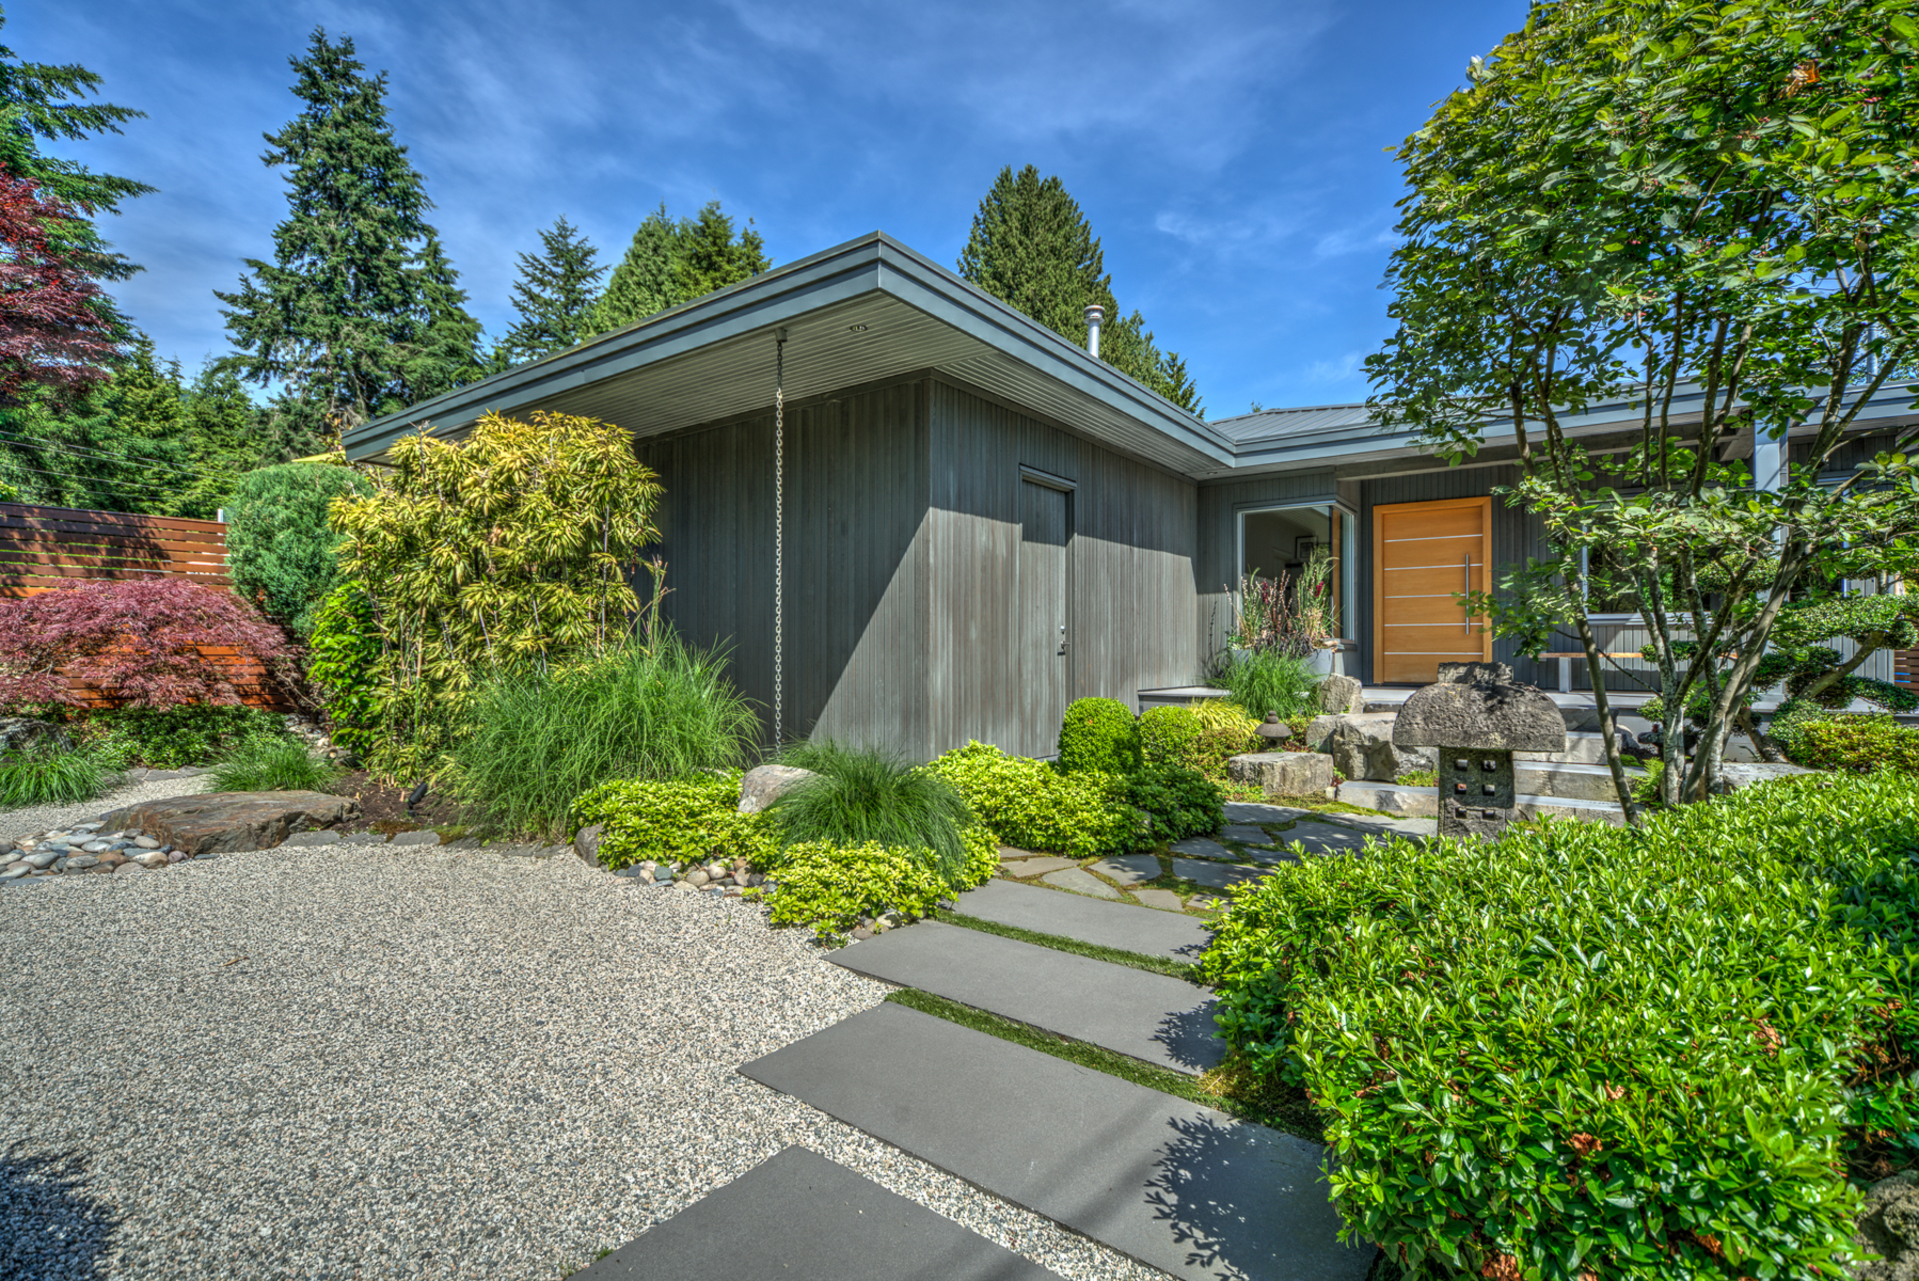 4362-stearman-ave-wv-360hometours-15s at 4362 Stearman Avenue, Caulfeild, West Vancouver